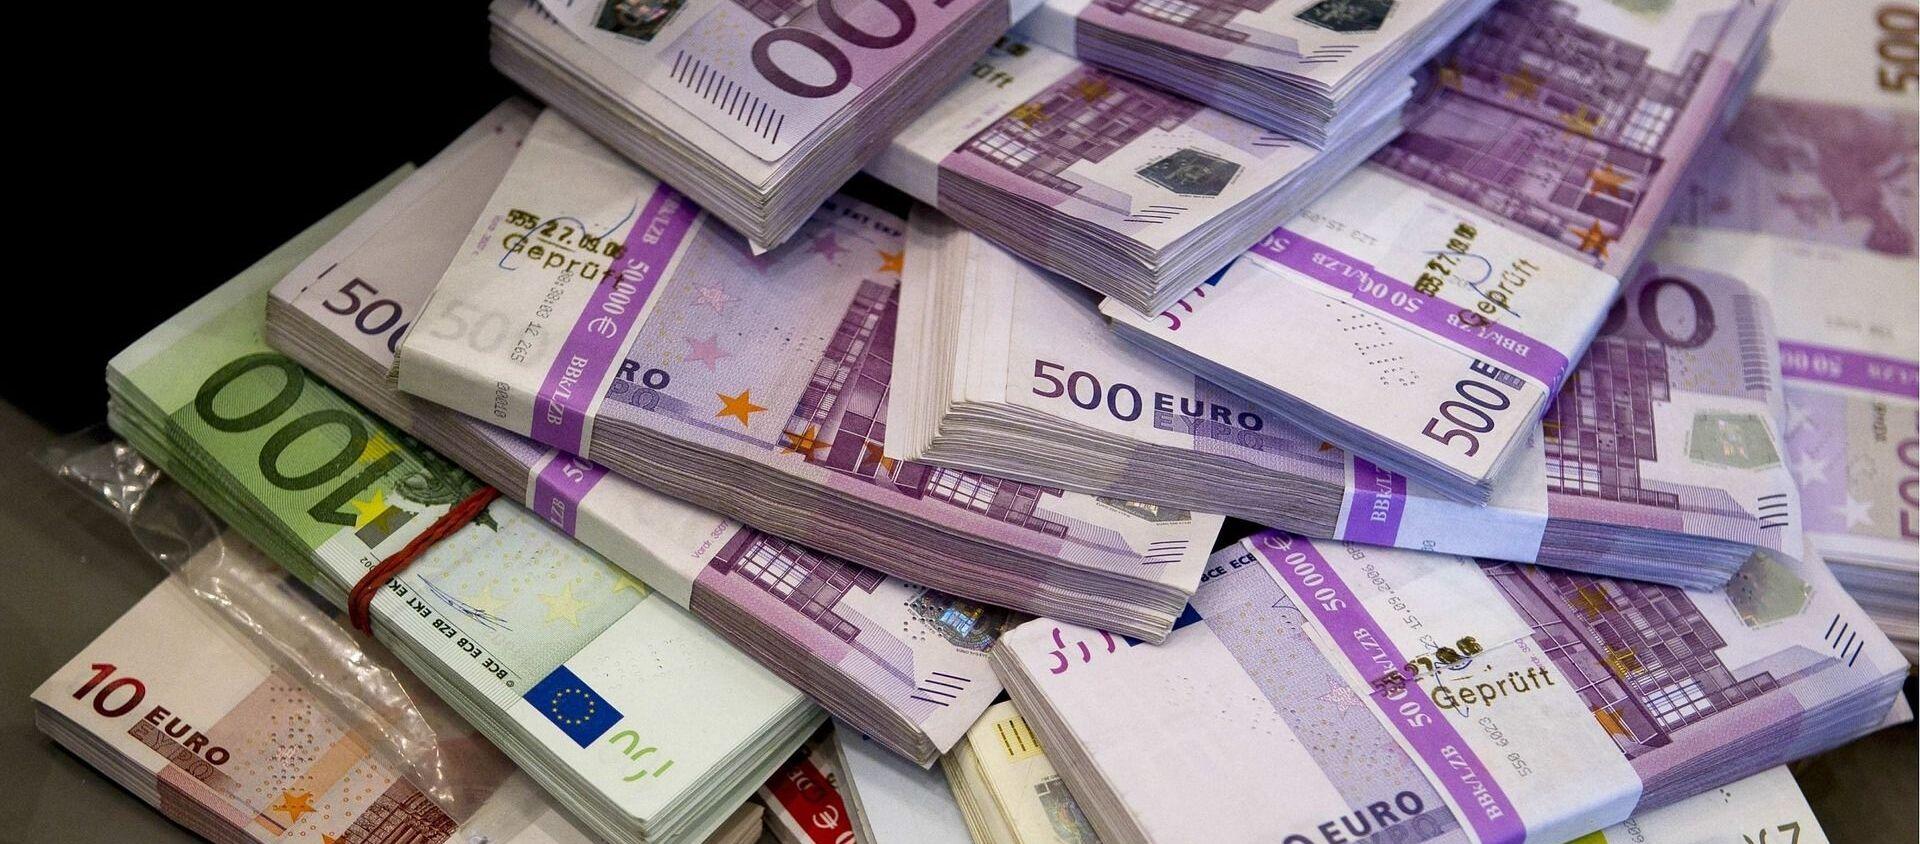 Billetes de euro - Sputnik Mundo, 1920, 10.01.2020